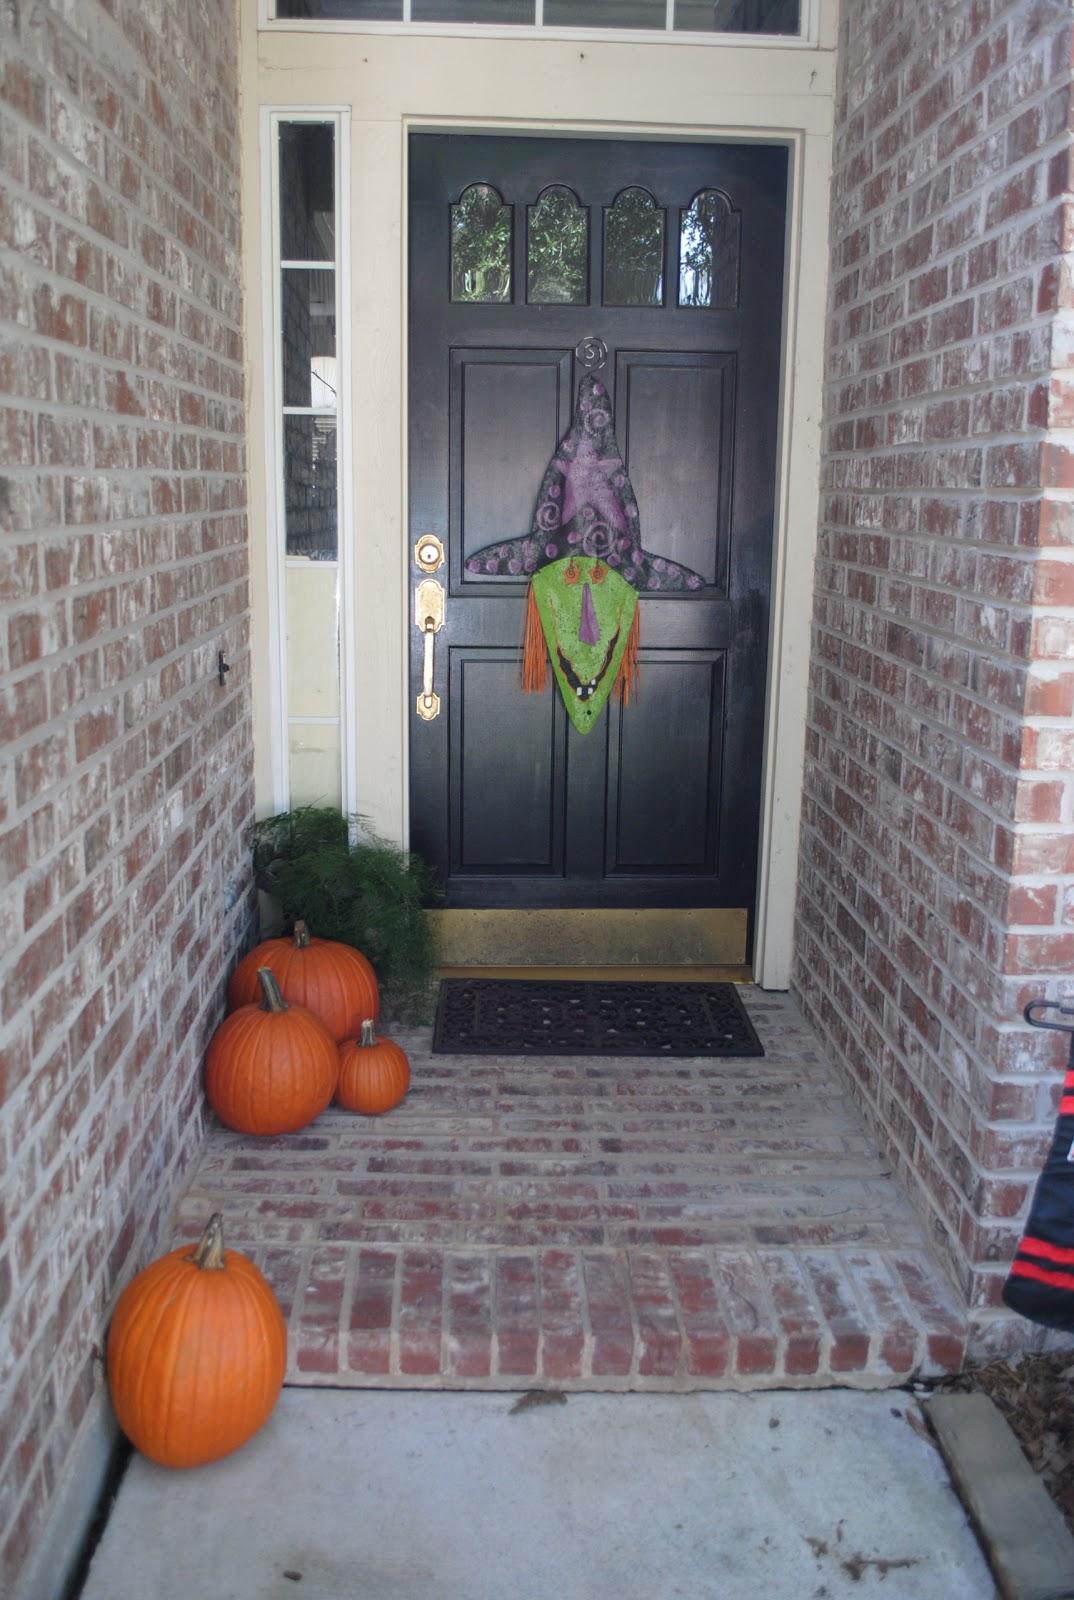 halloween decorations 2010. Black Bedroom Furniture Sets. Home Design Ideas